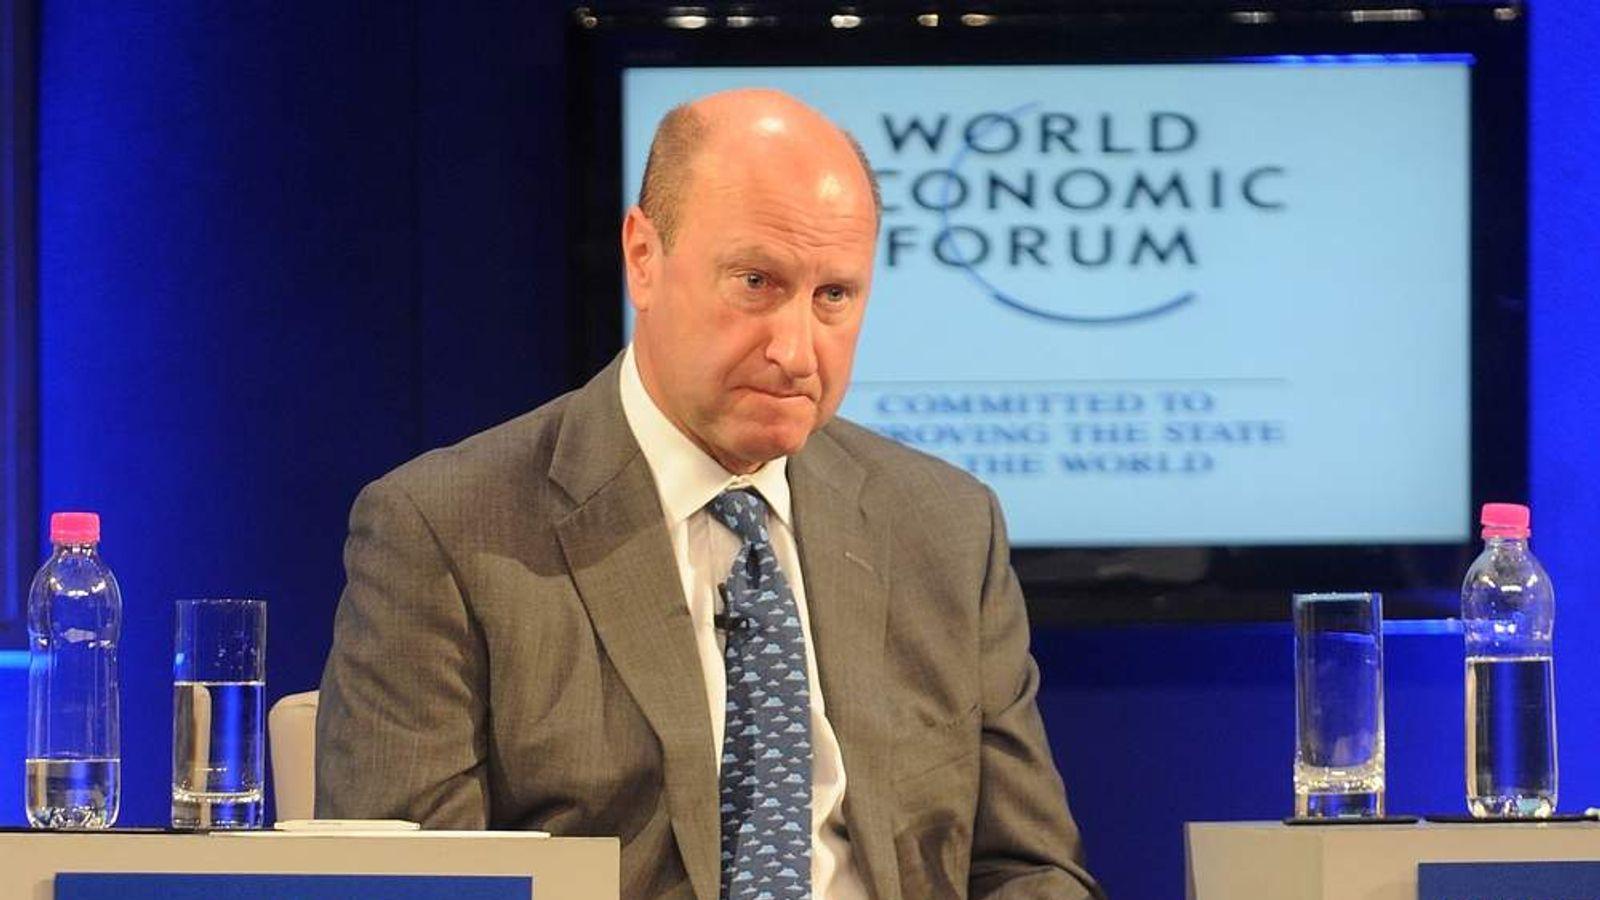 Rich Ricci of Barclays bank